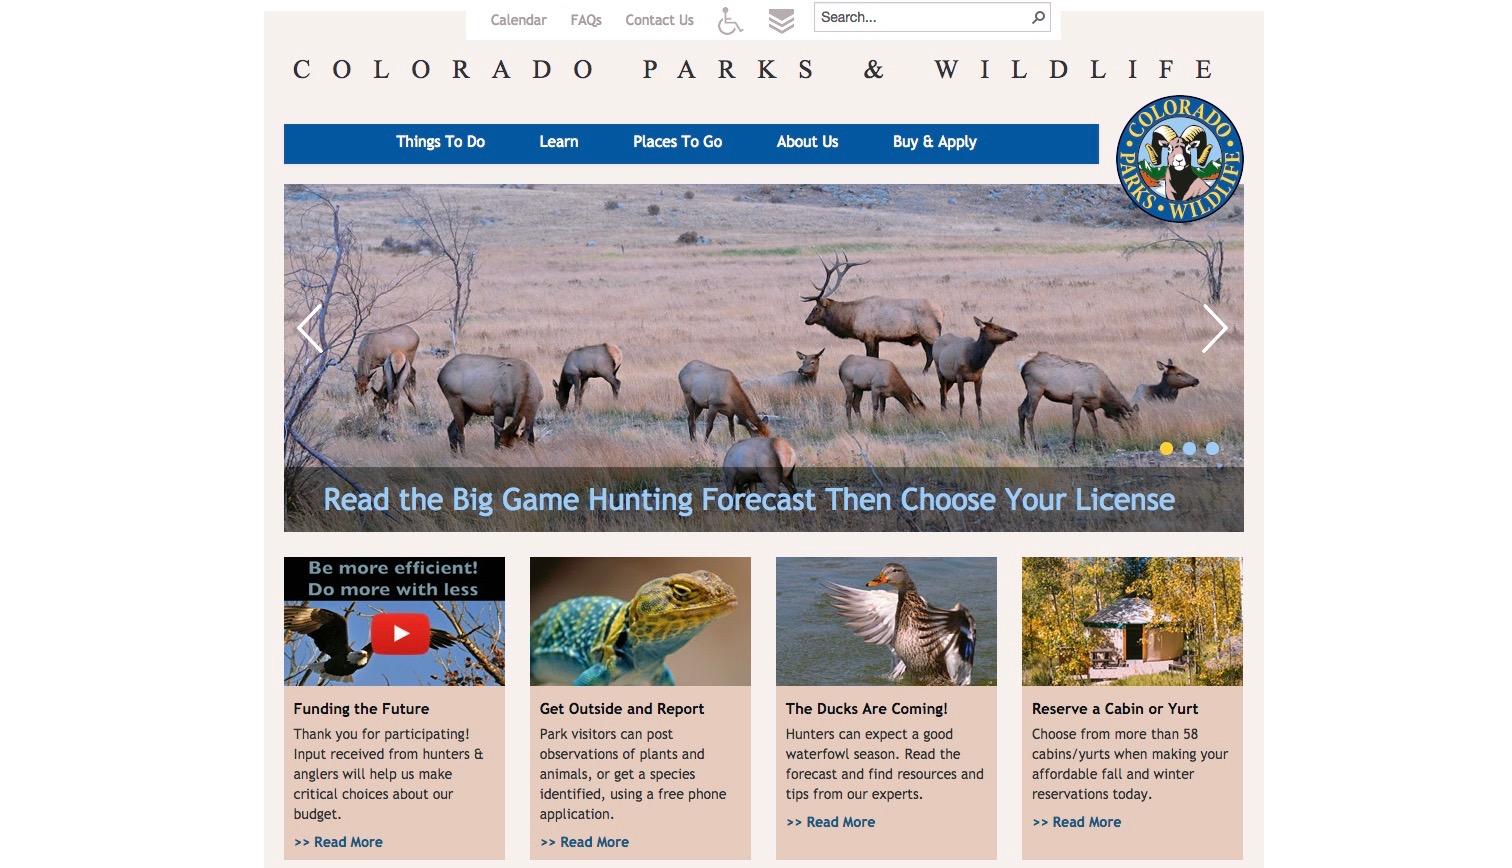 Colorado Parks & Wildlife website